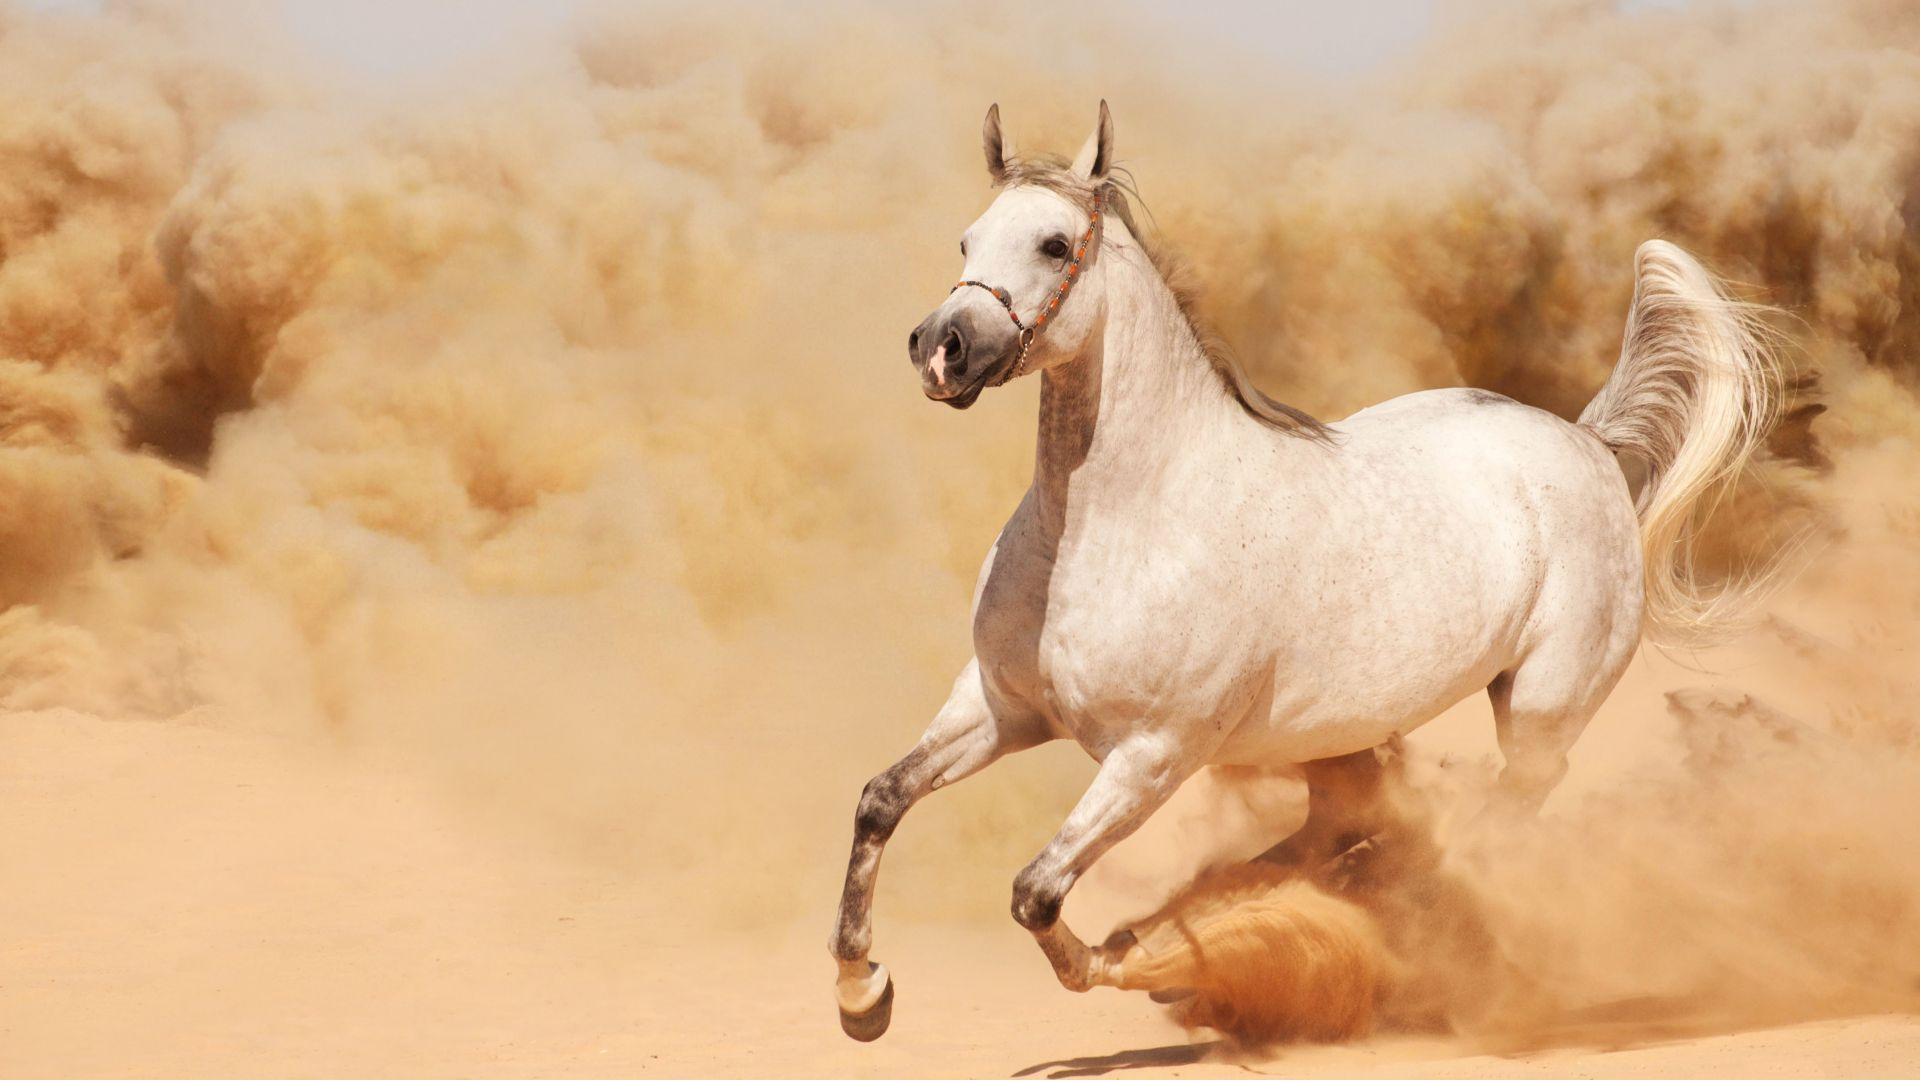 8k Animal Wallpaper Download: Wallpaper Horse, 8k, Animals #14946